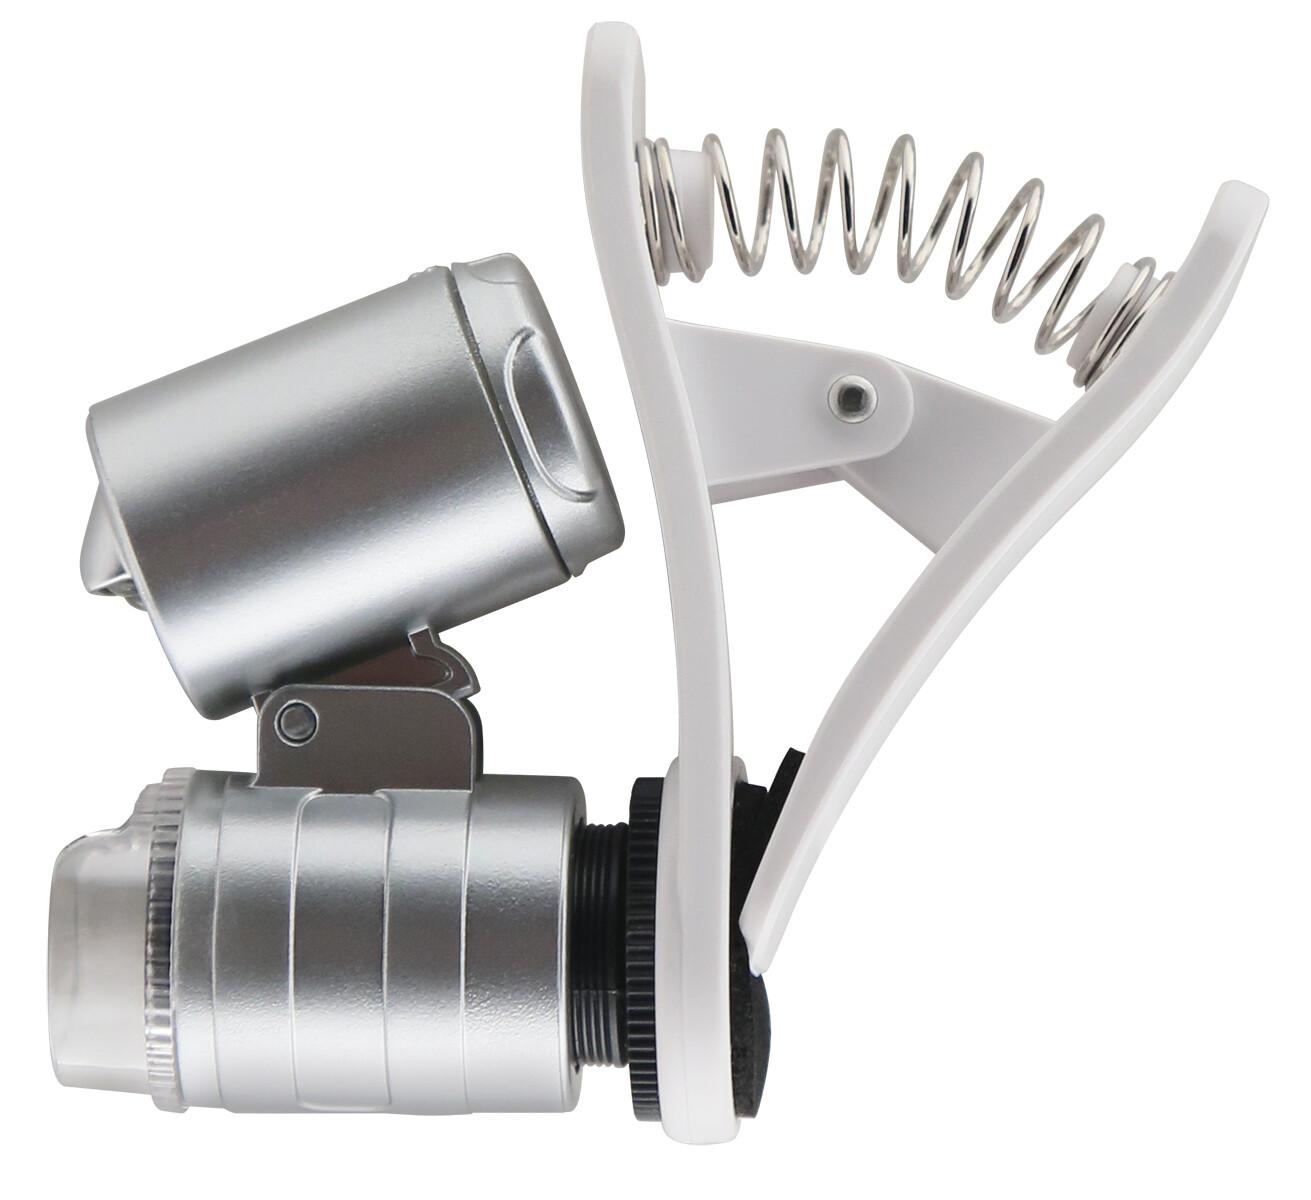 Grower's Edge Universal Cell Phone Microscope